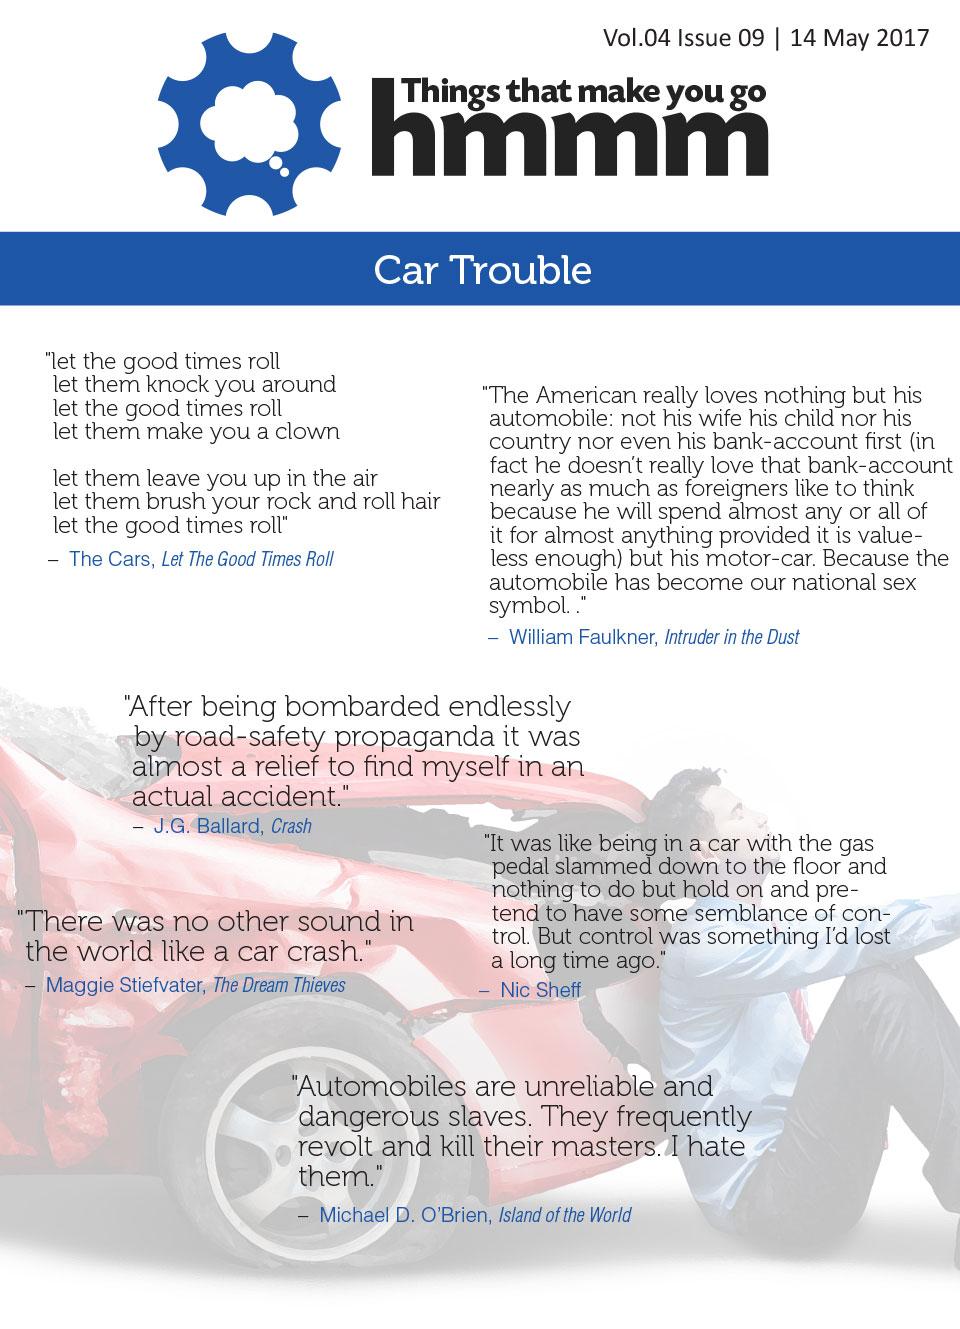 TTMYGH_2017_05_14_Car_Trouble